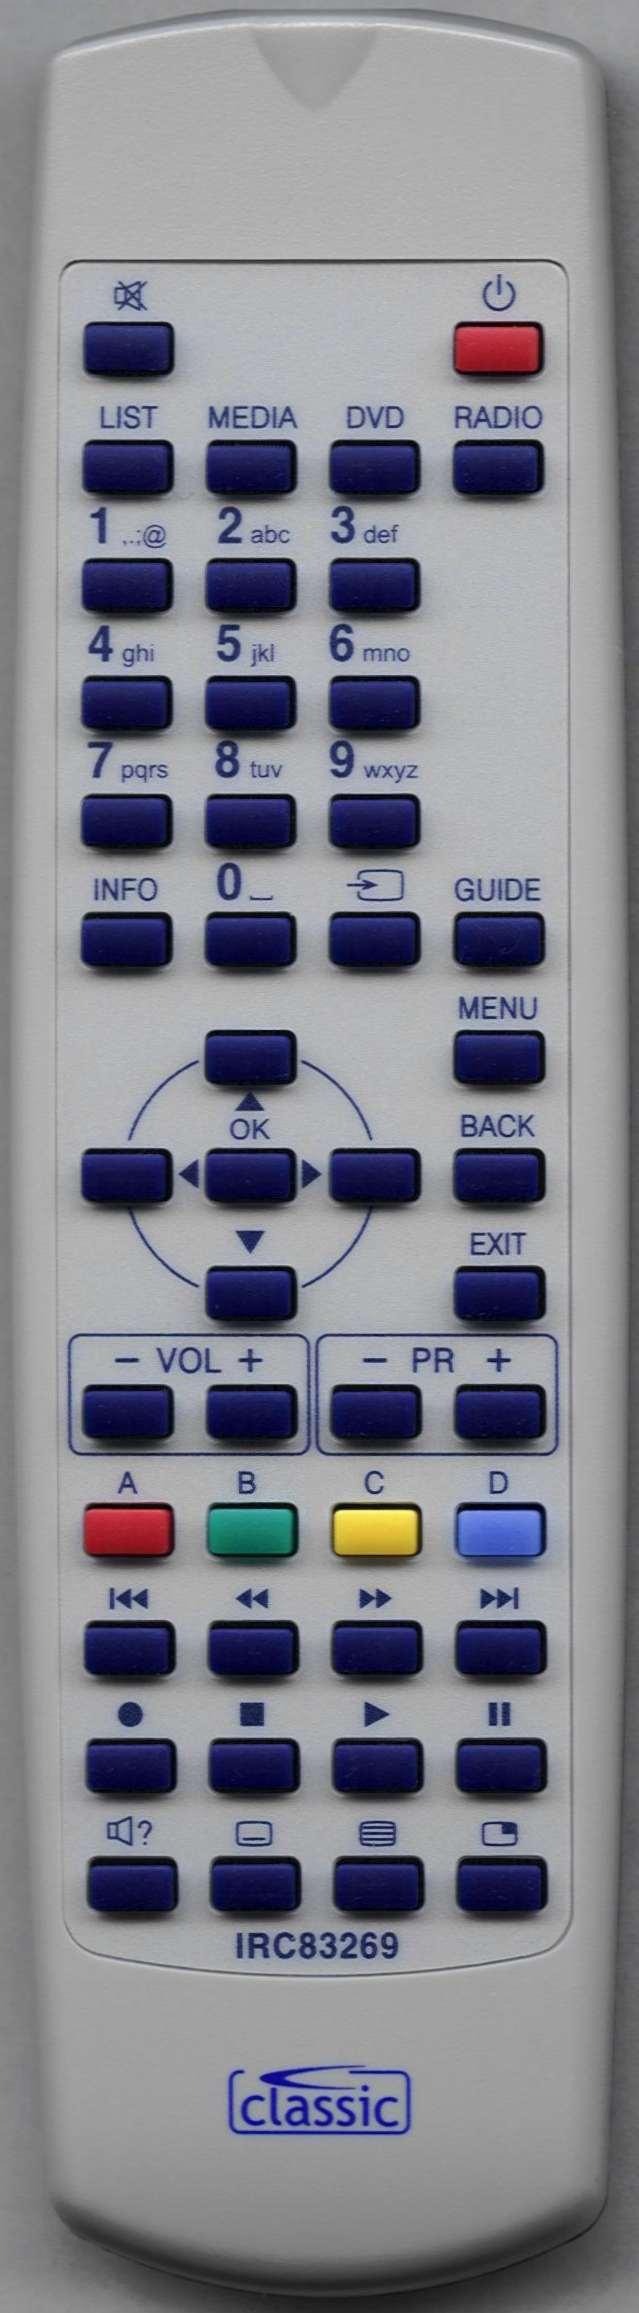 SAGEMCOM DTR 67500T Replacement Remote Control